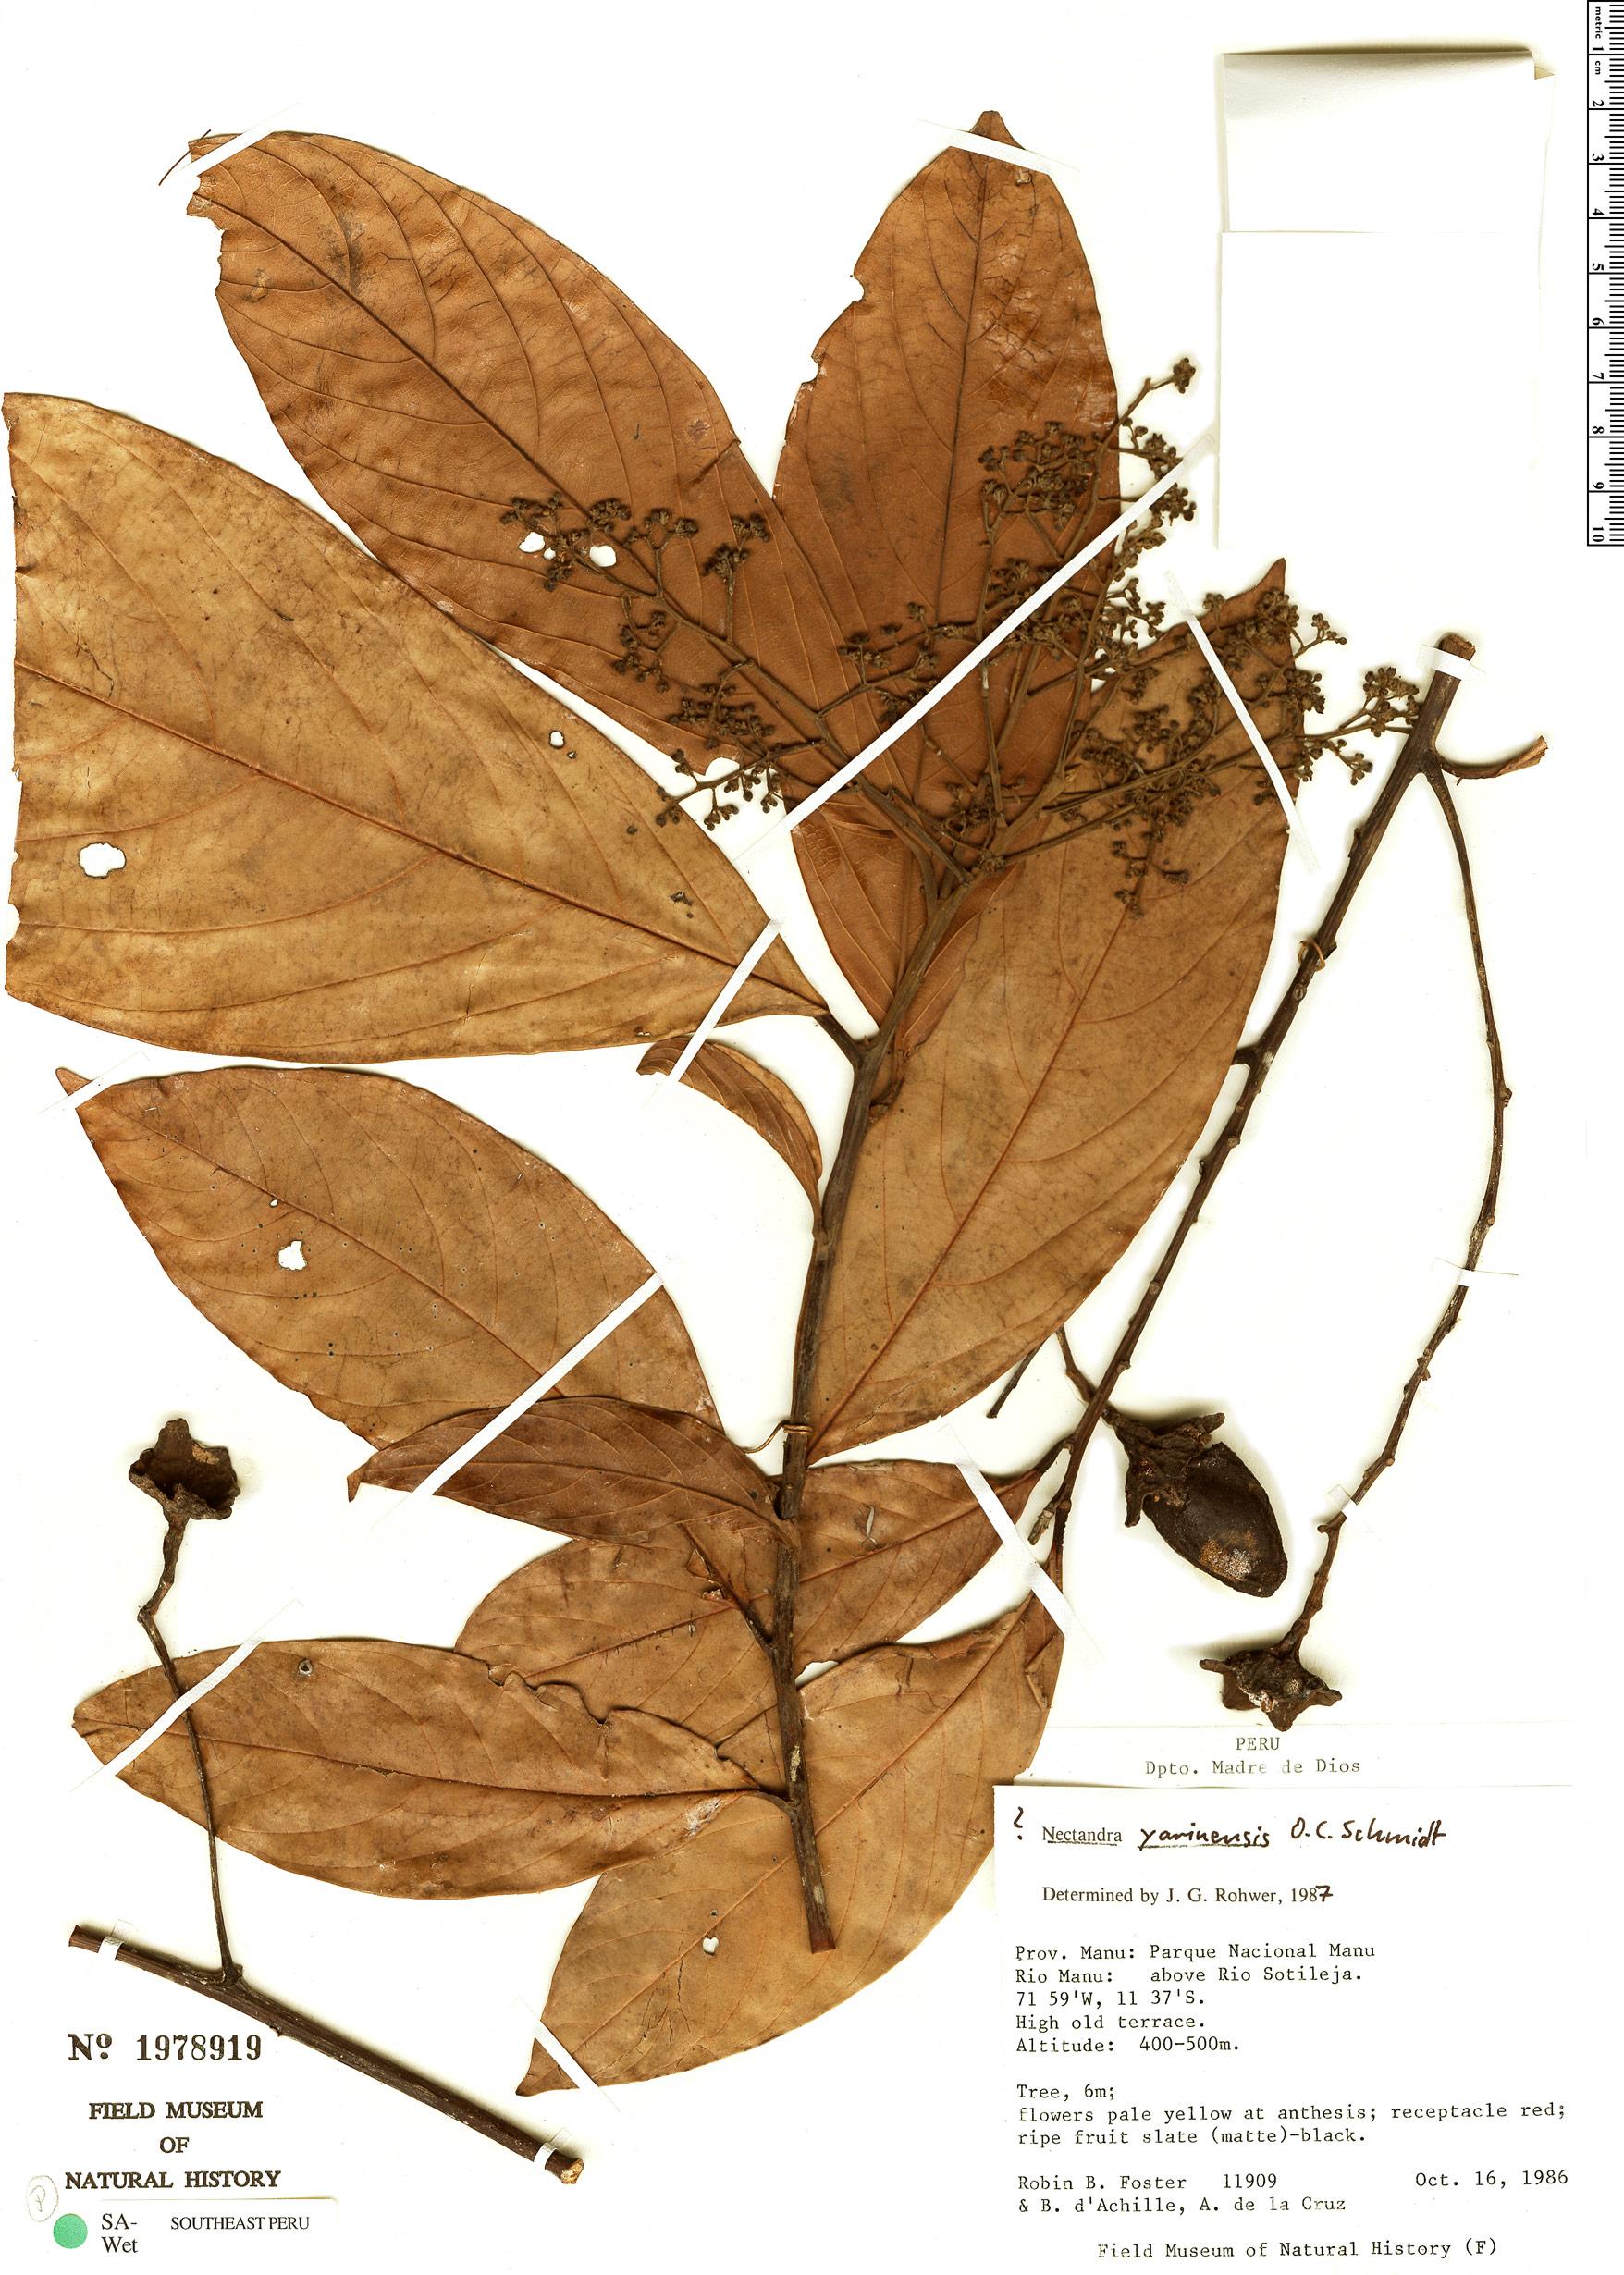 Specimen: Nectandra yarinensis